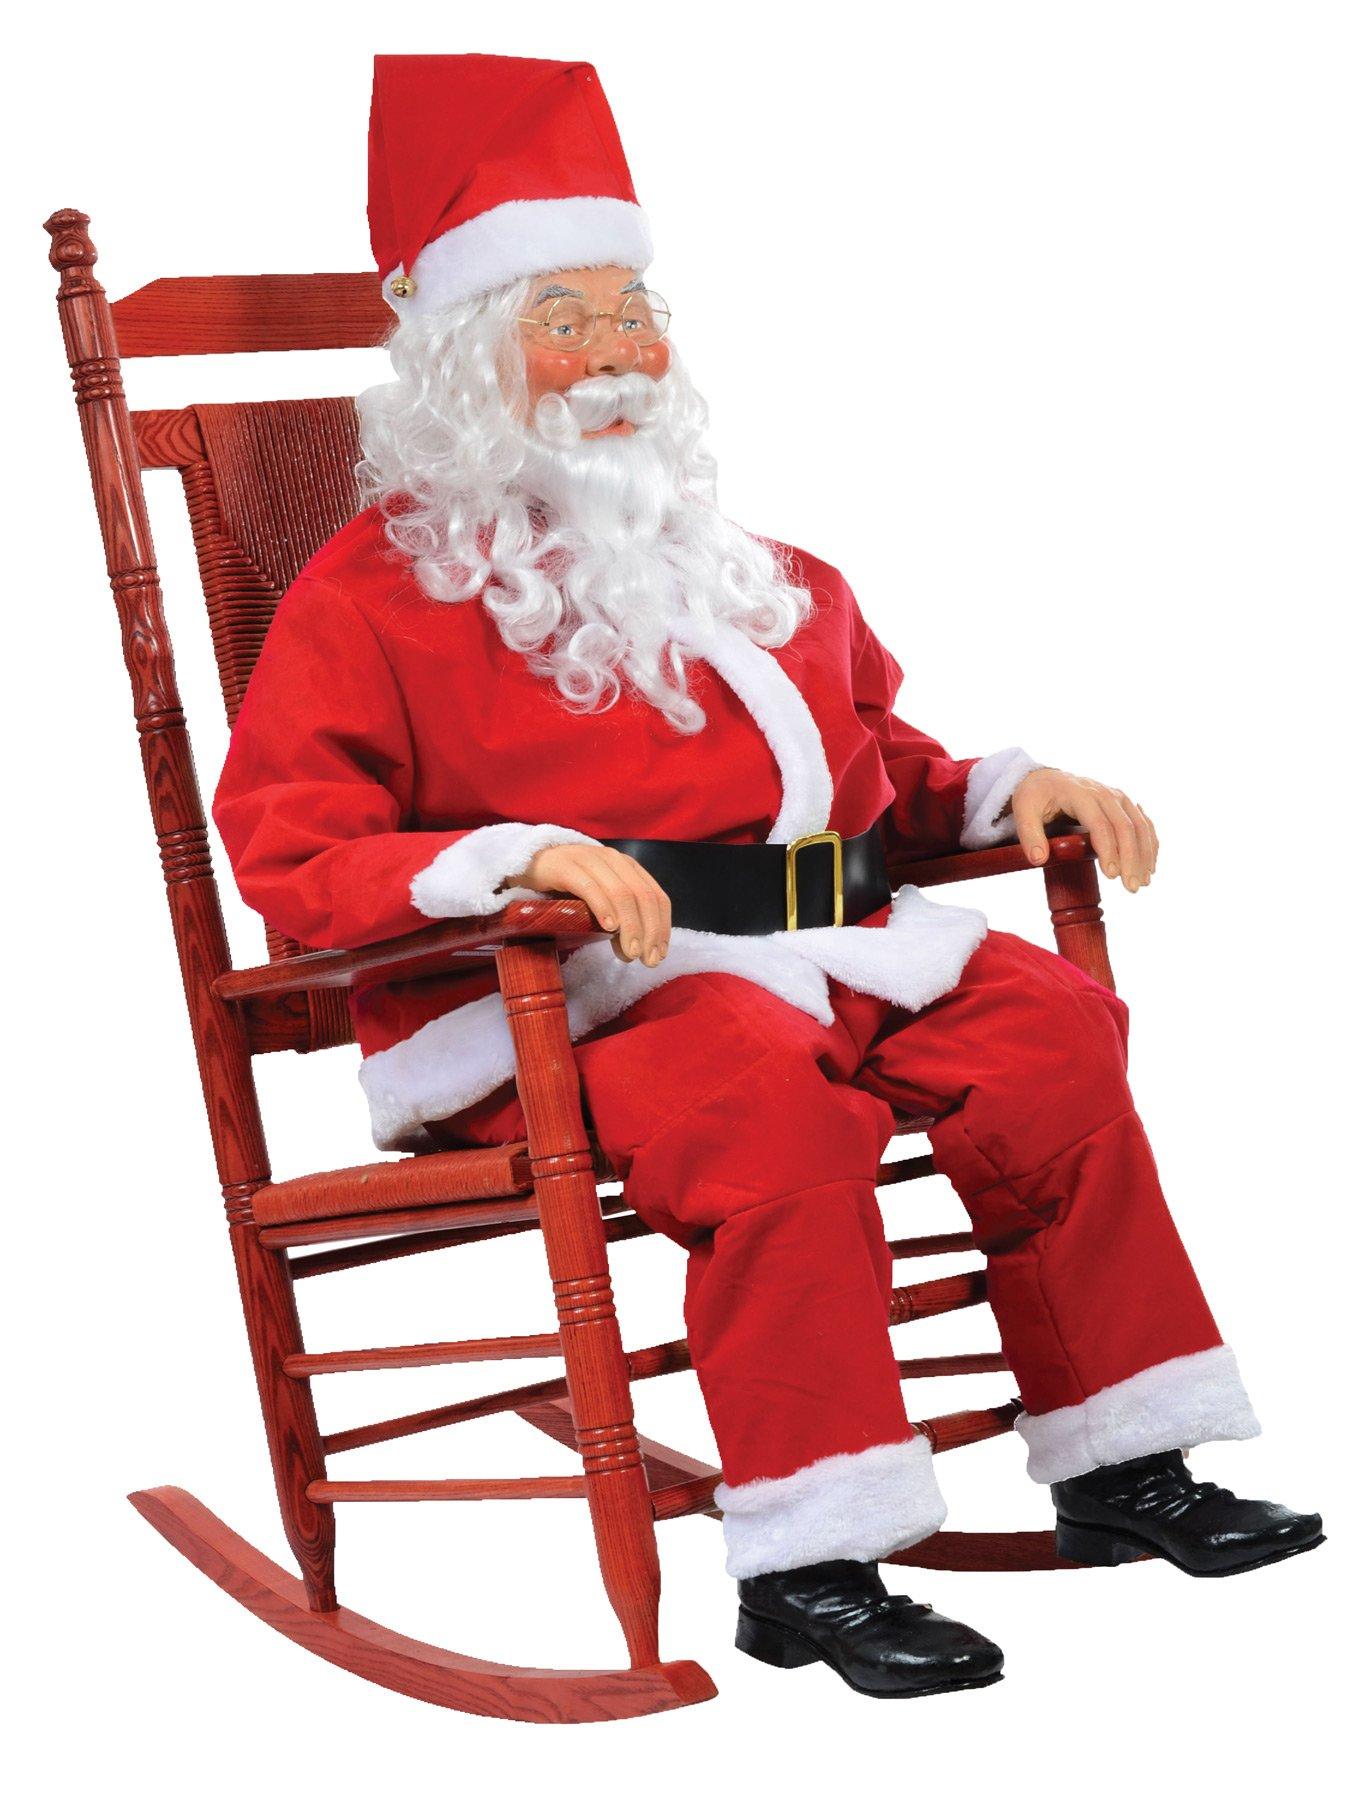 CHRISTMAS TALKING REALISTIC LIFESIZE ANIMATED ROCKIN SANTA CLAUS